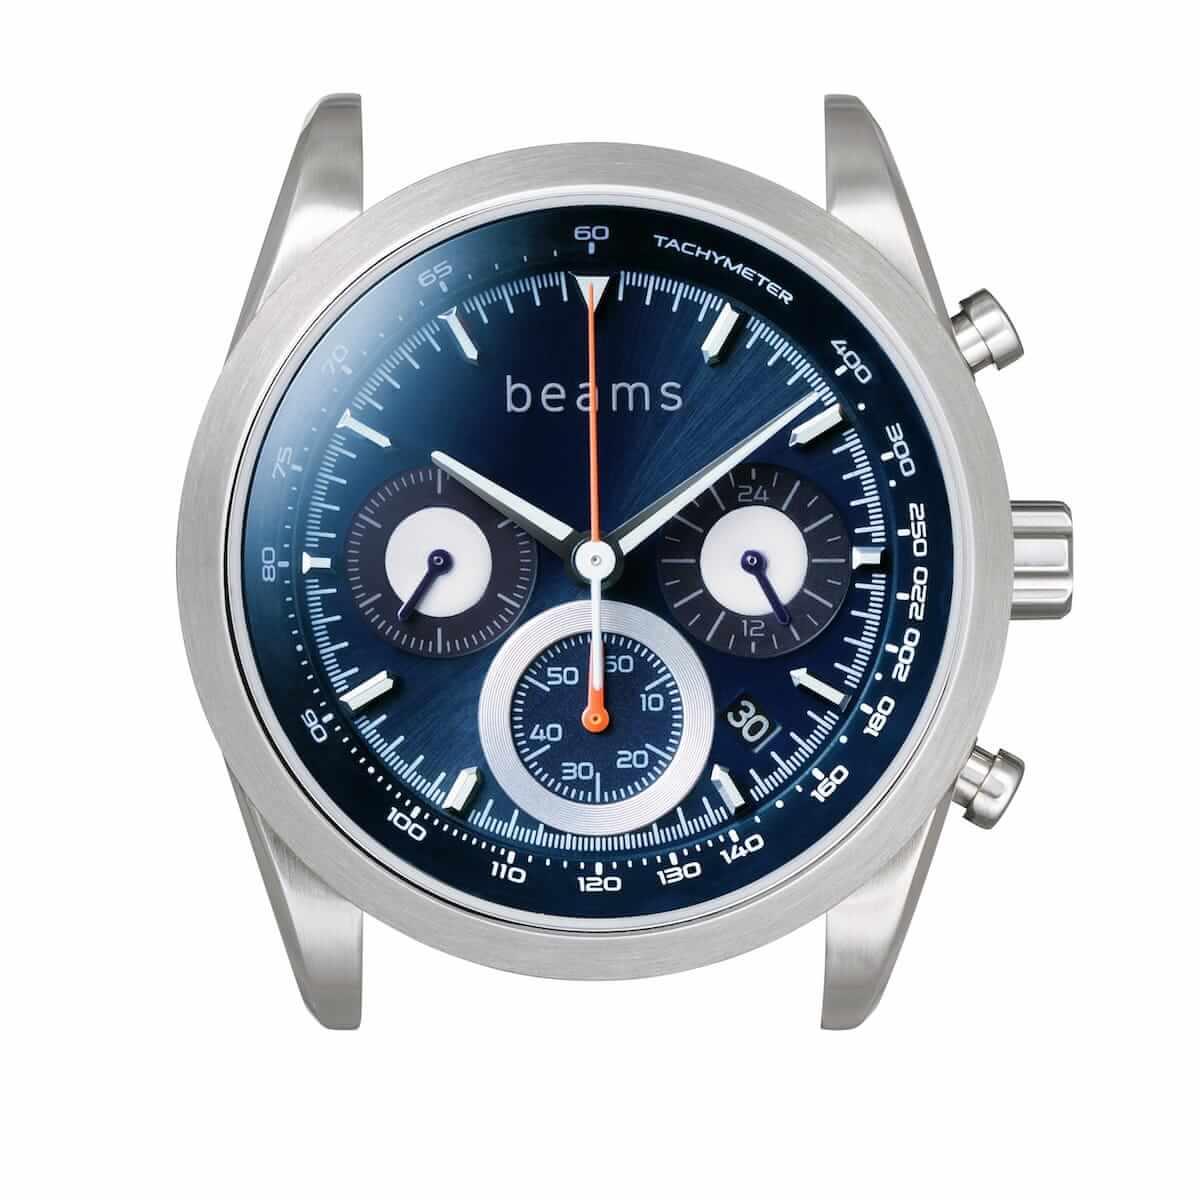 wena × beams コラボ第三弾、初のソーラー式の時計ヘッド部を採用! technology180626_wena_beams_03-1200x1200